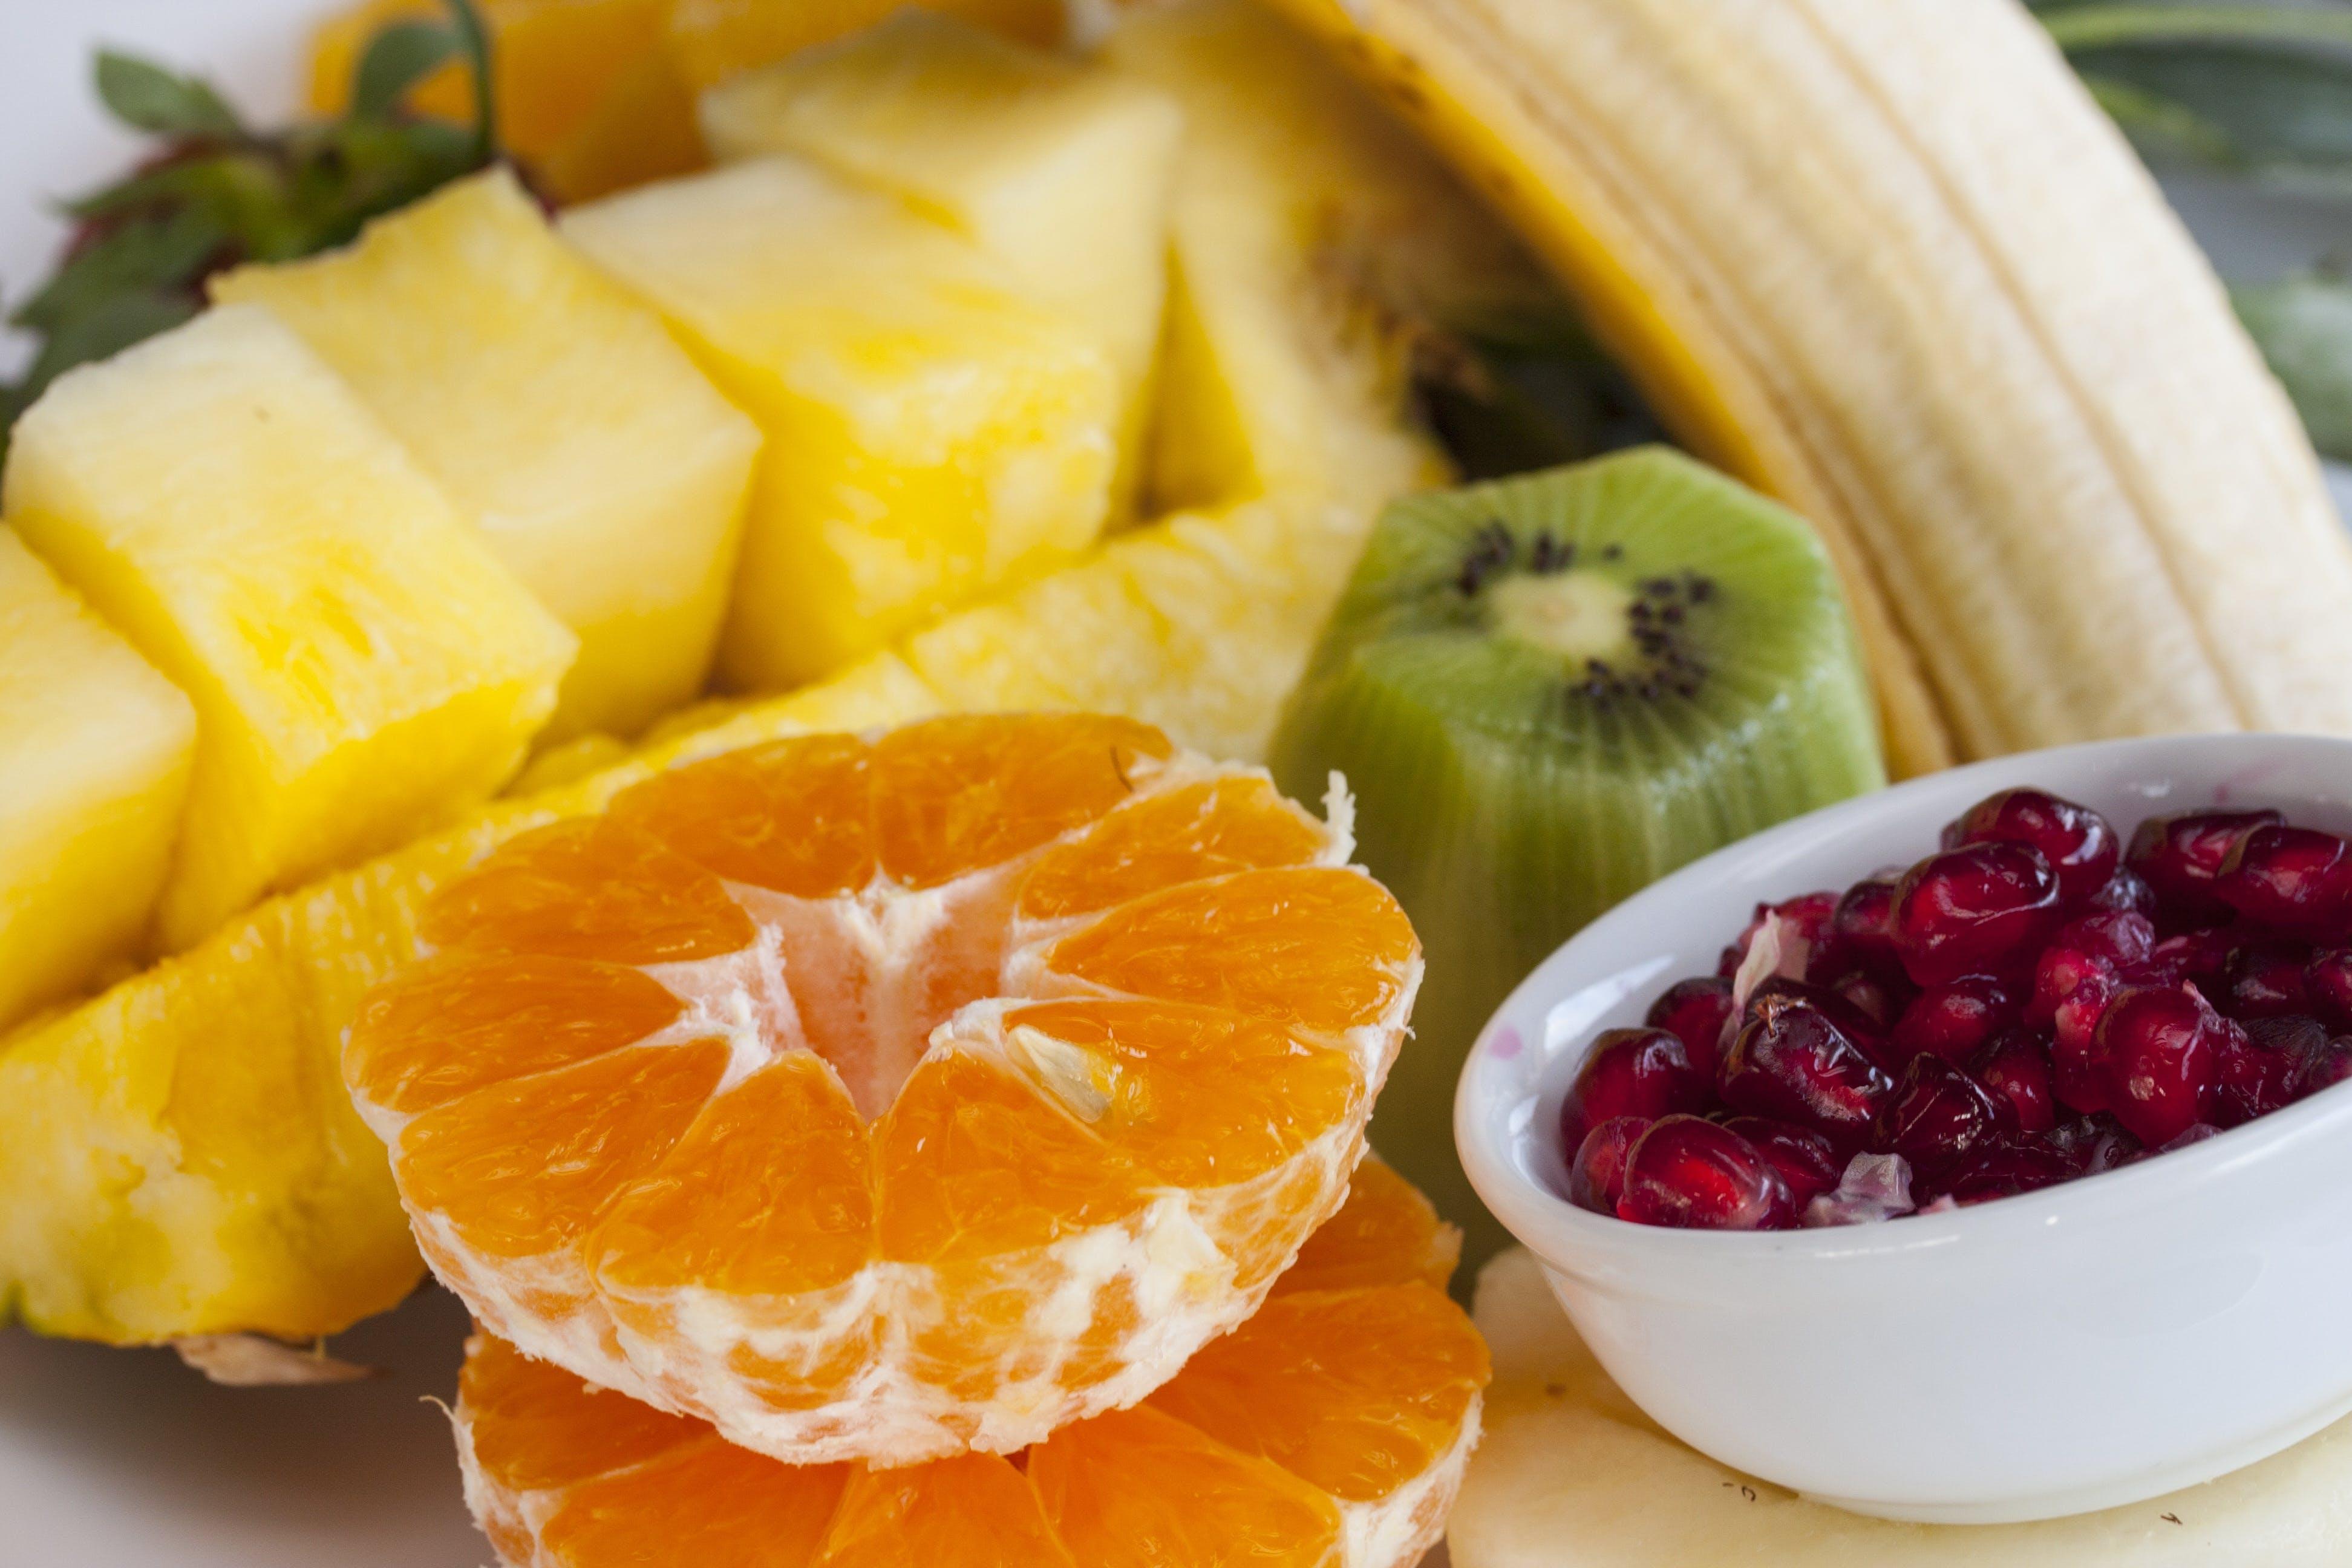 Free stock photo of food, orange, breakfast, pineapple